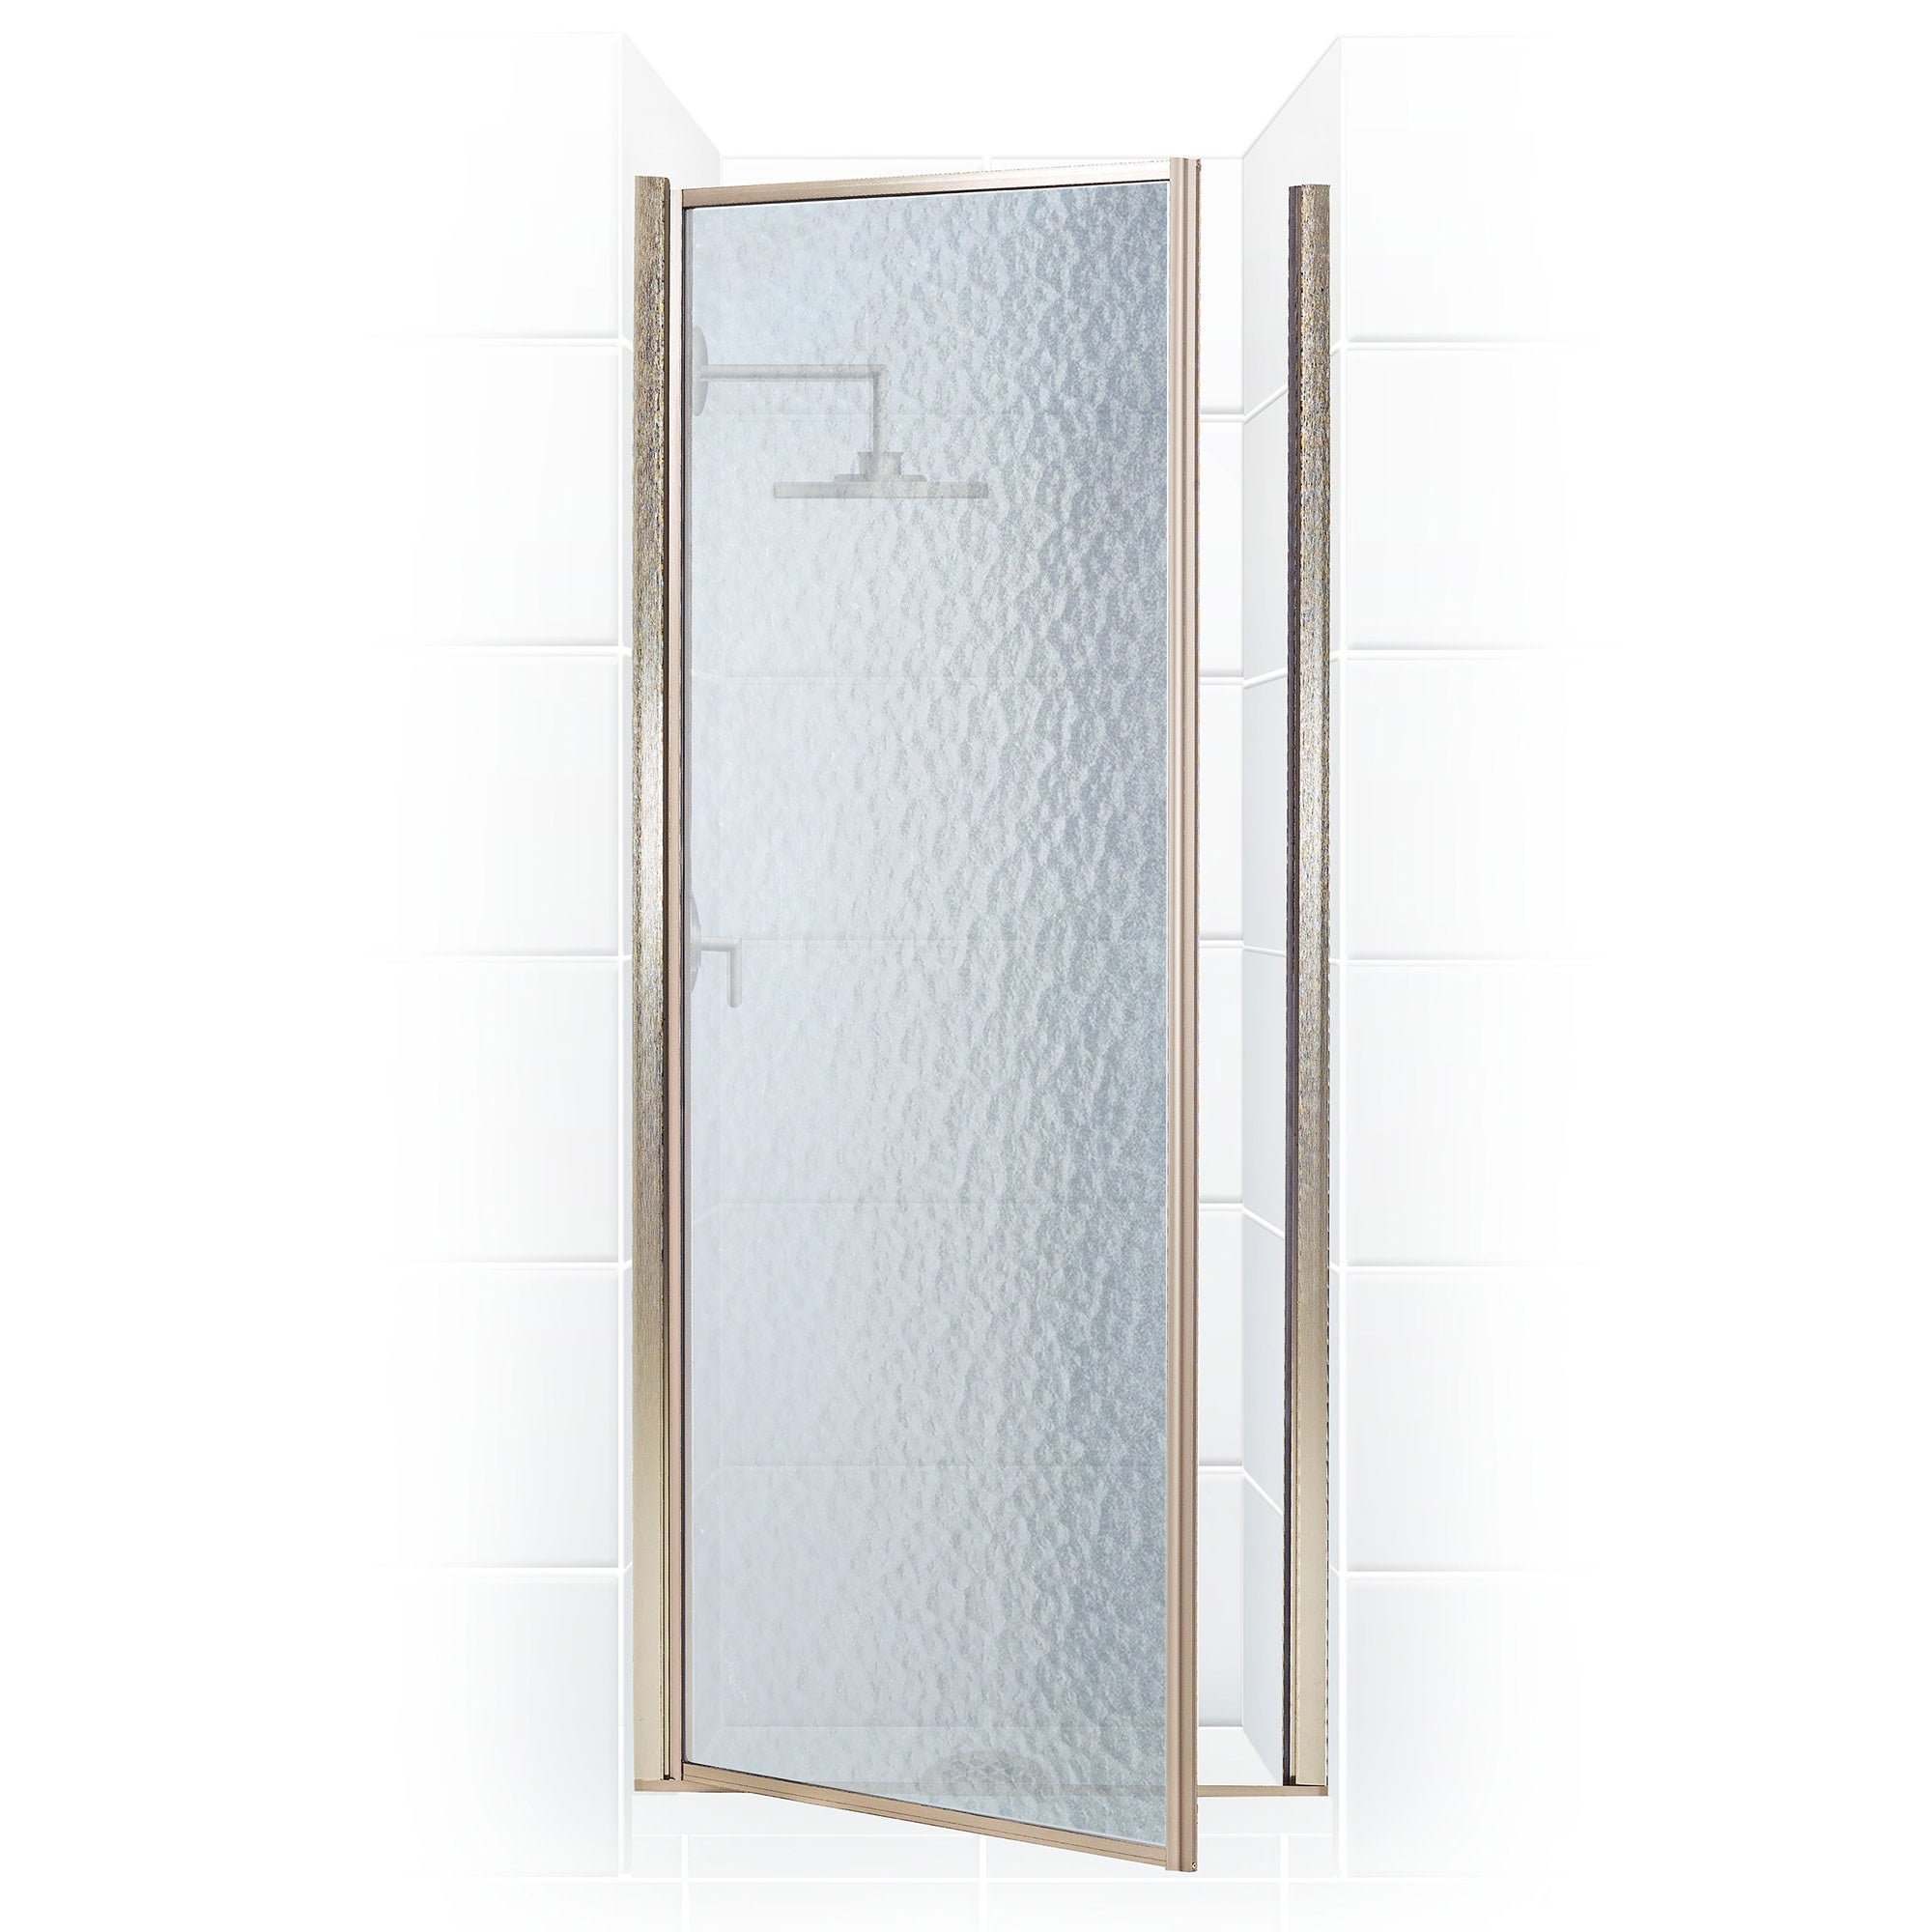 Shower Doors.Coastal Shower Doors L22 69 A Legend Series 22 X 68 Framed Hinge Shower Door With Obscure Glass